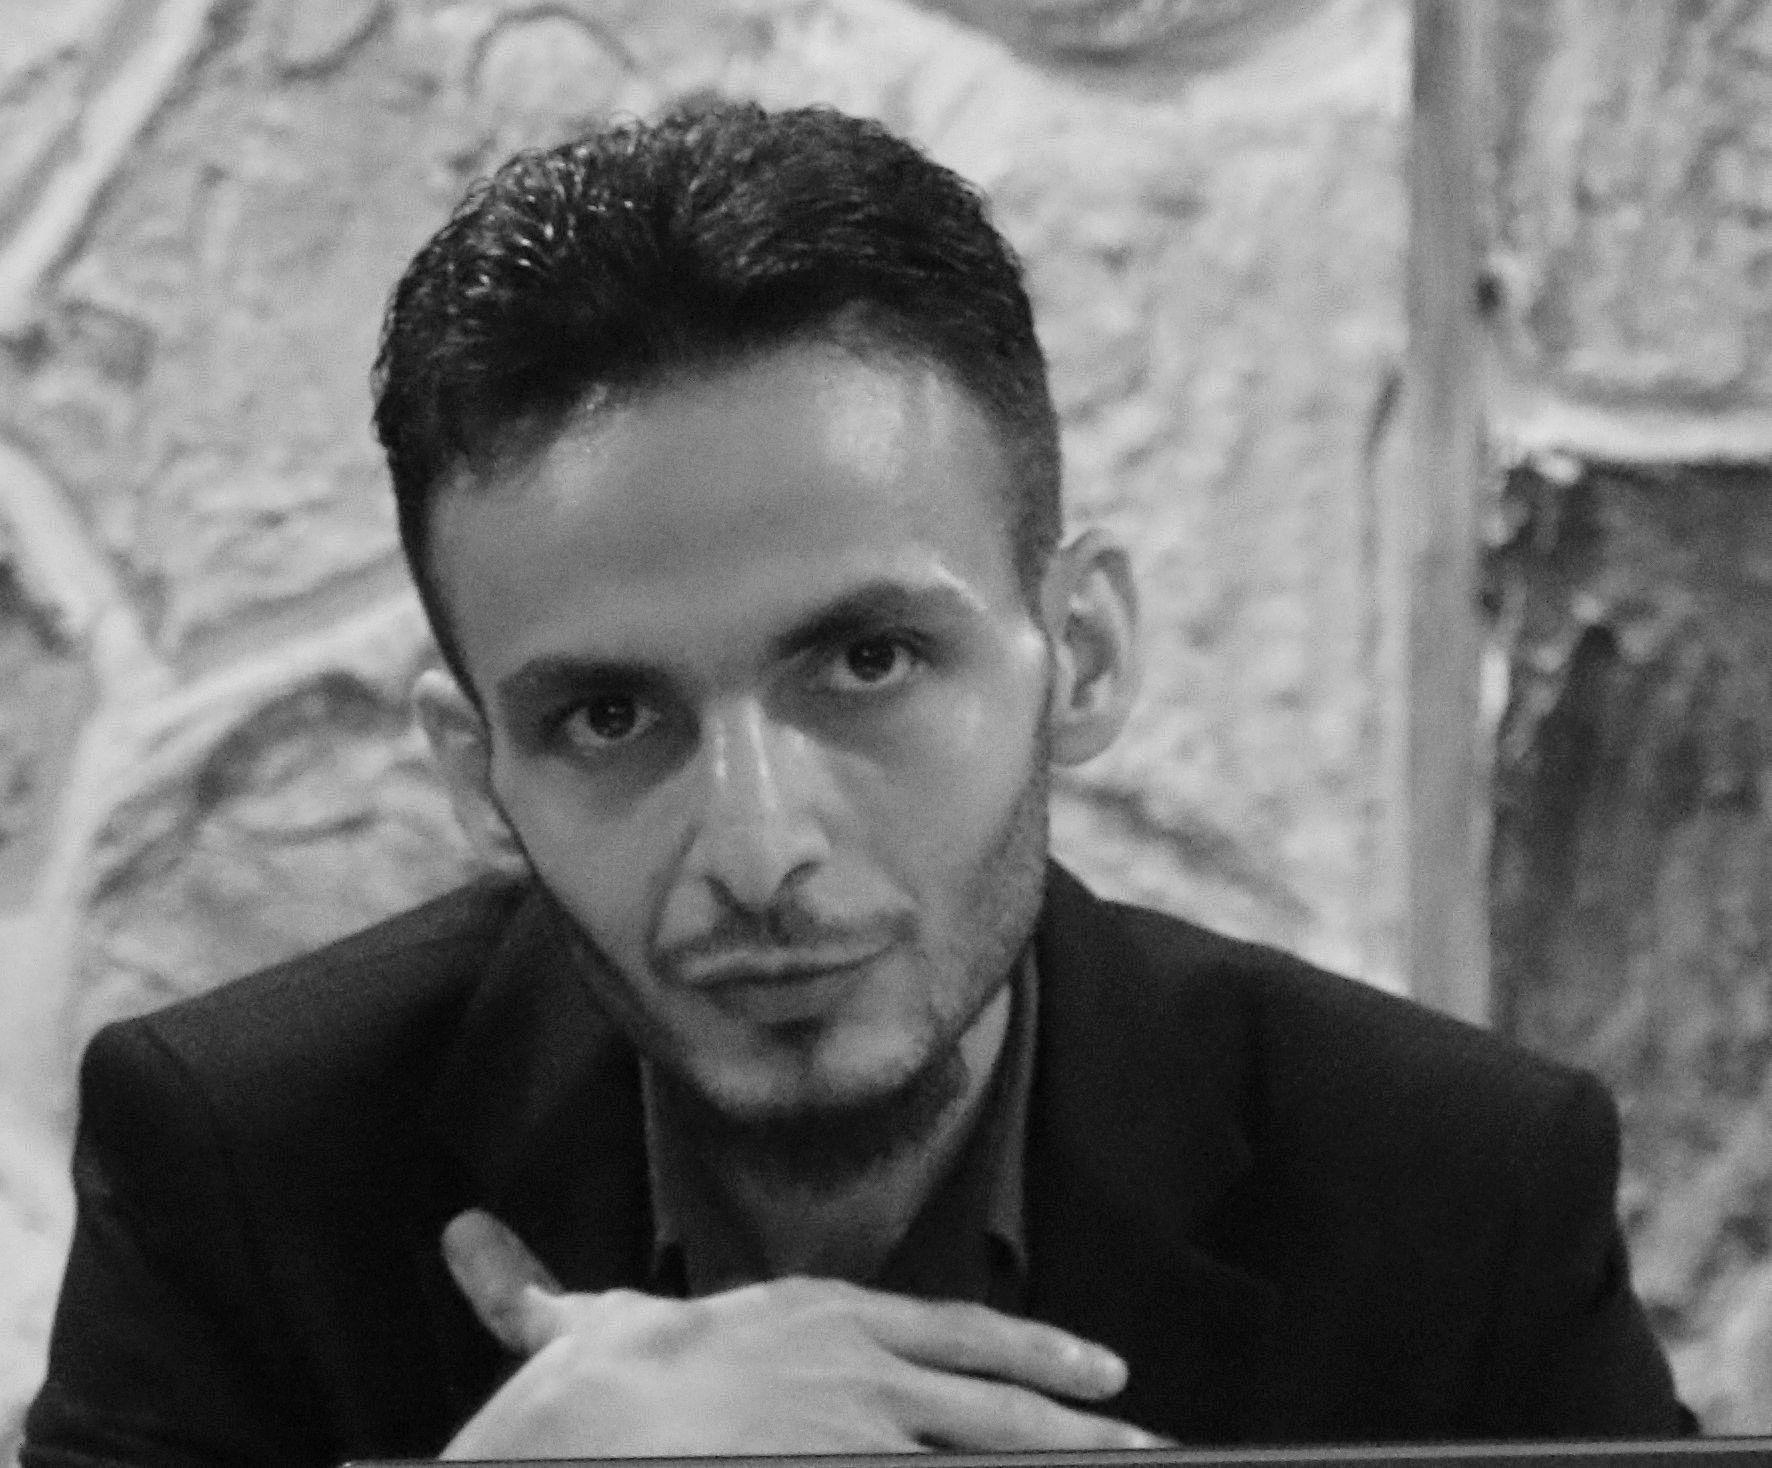 محمد نور Headshot